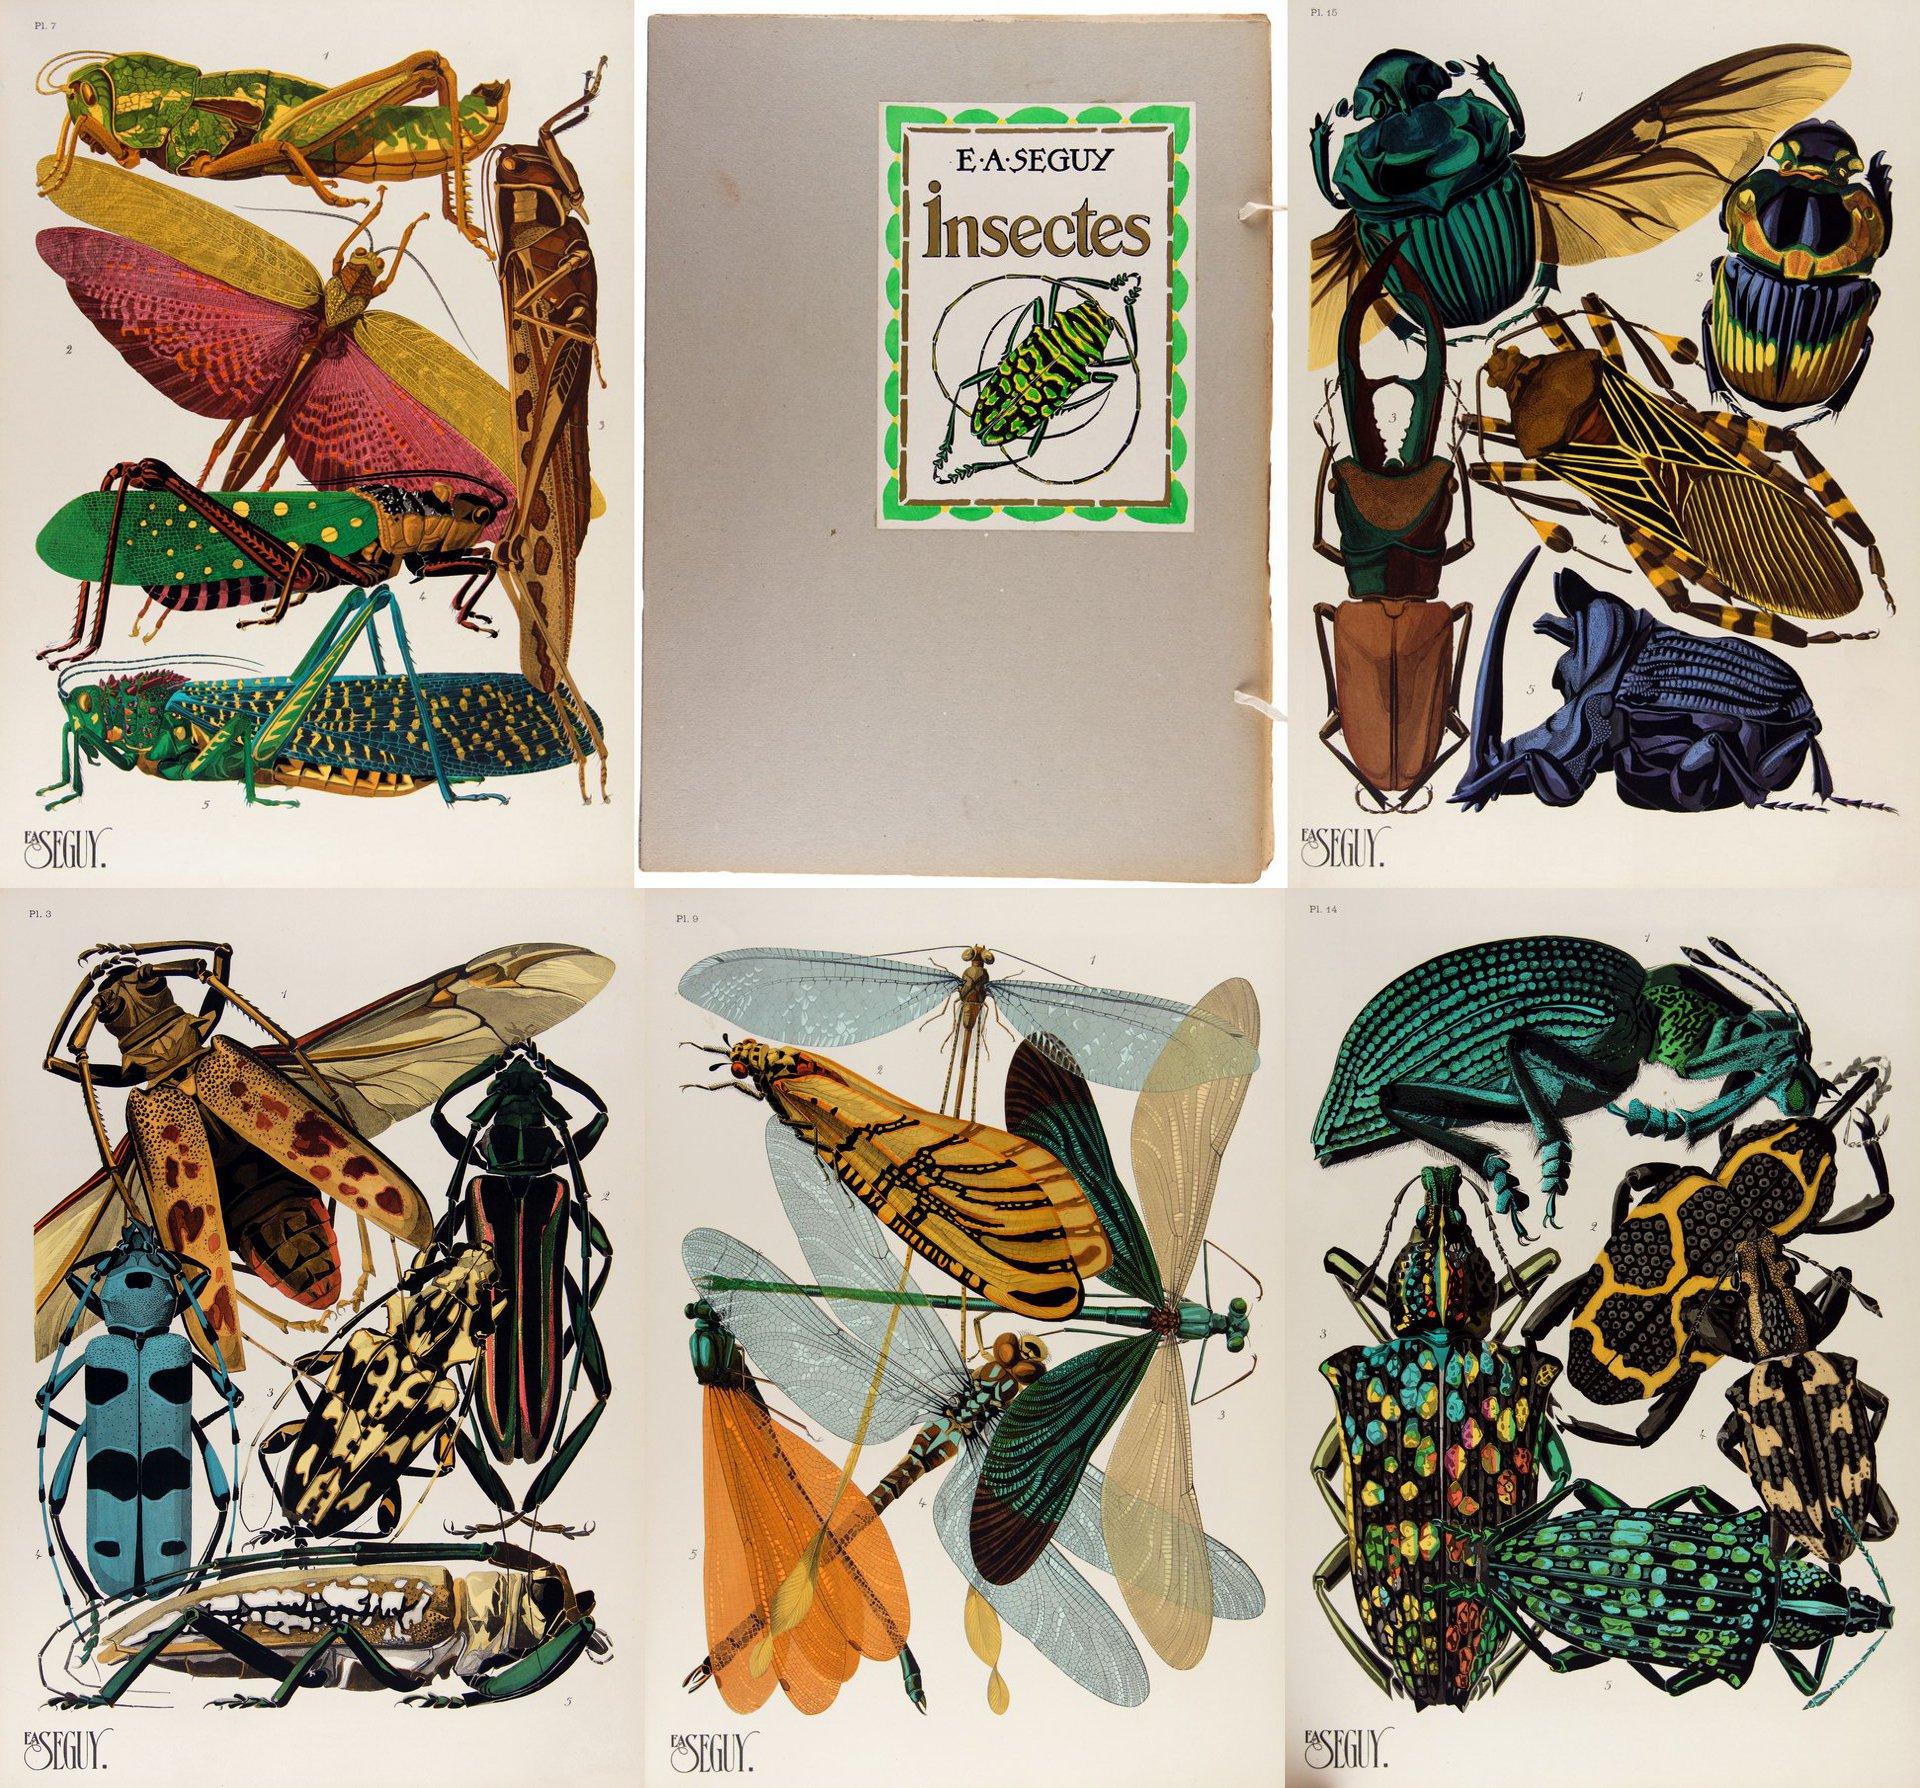 1926-EMILE-ALLAIN-SEGUY-INSECTES-ART-DECO-EDITION-ORIGINAL